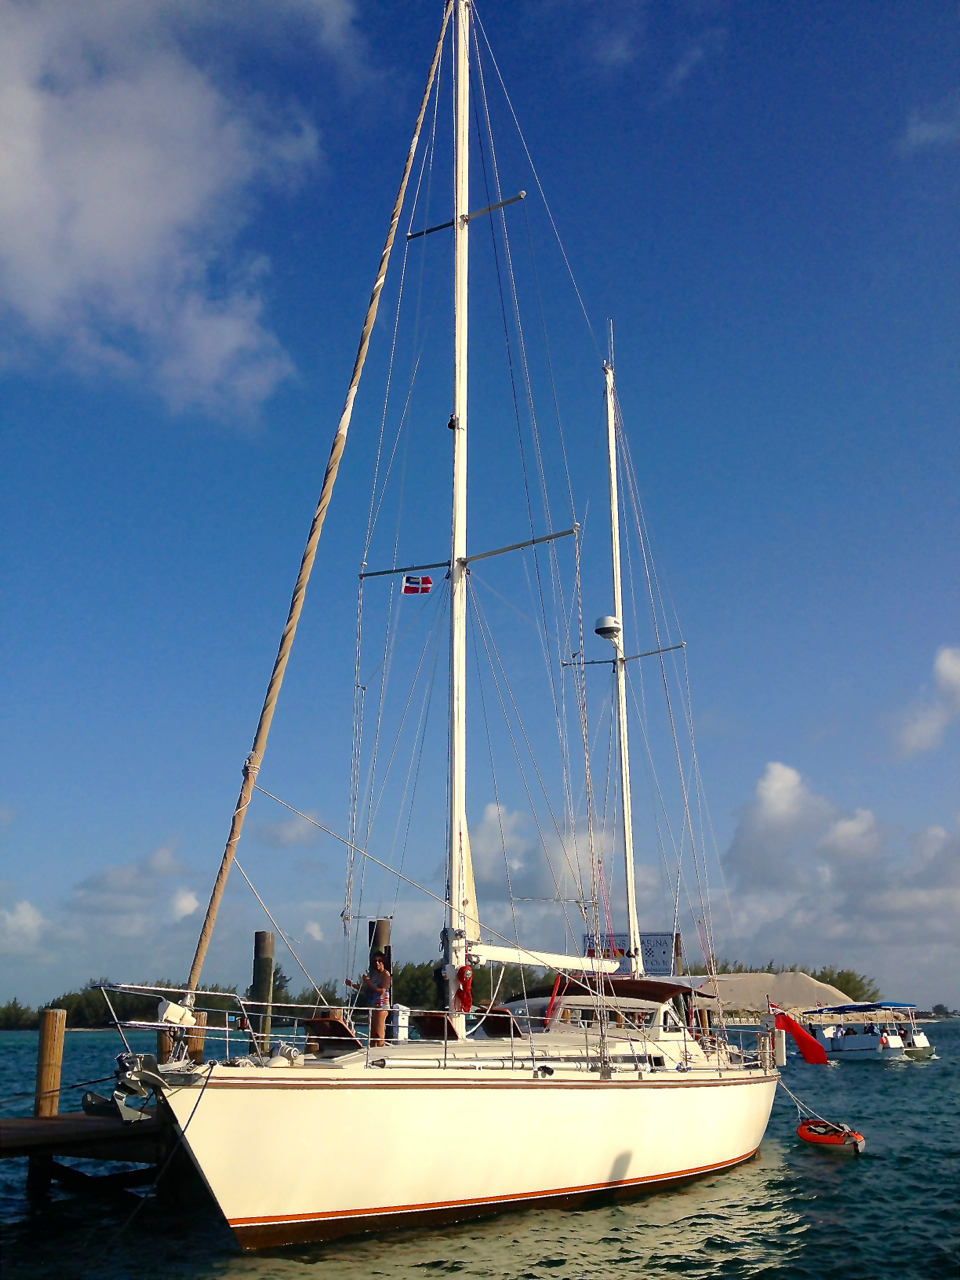 Browns Marina, Bimini, 30 July 2013, iPhone 4S @ f/2.4, ISO 50